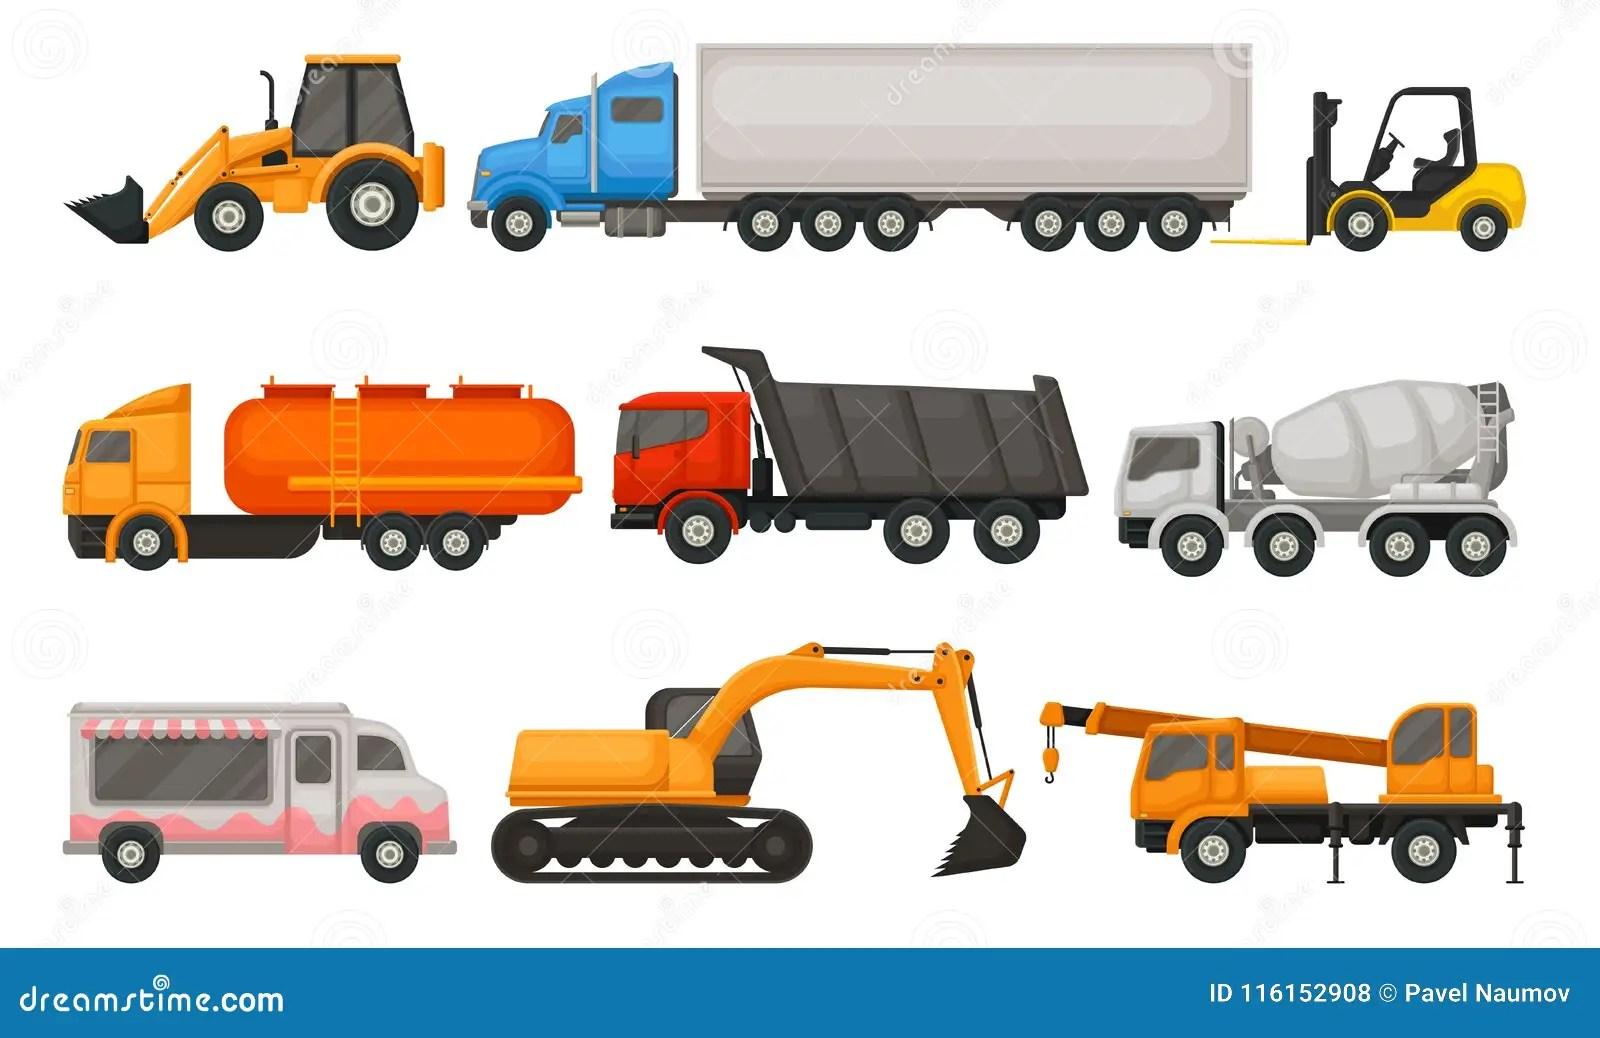 Flat Vector Set Of Various Types Of Vehicles Semi Trucks